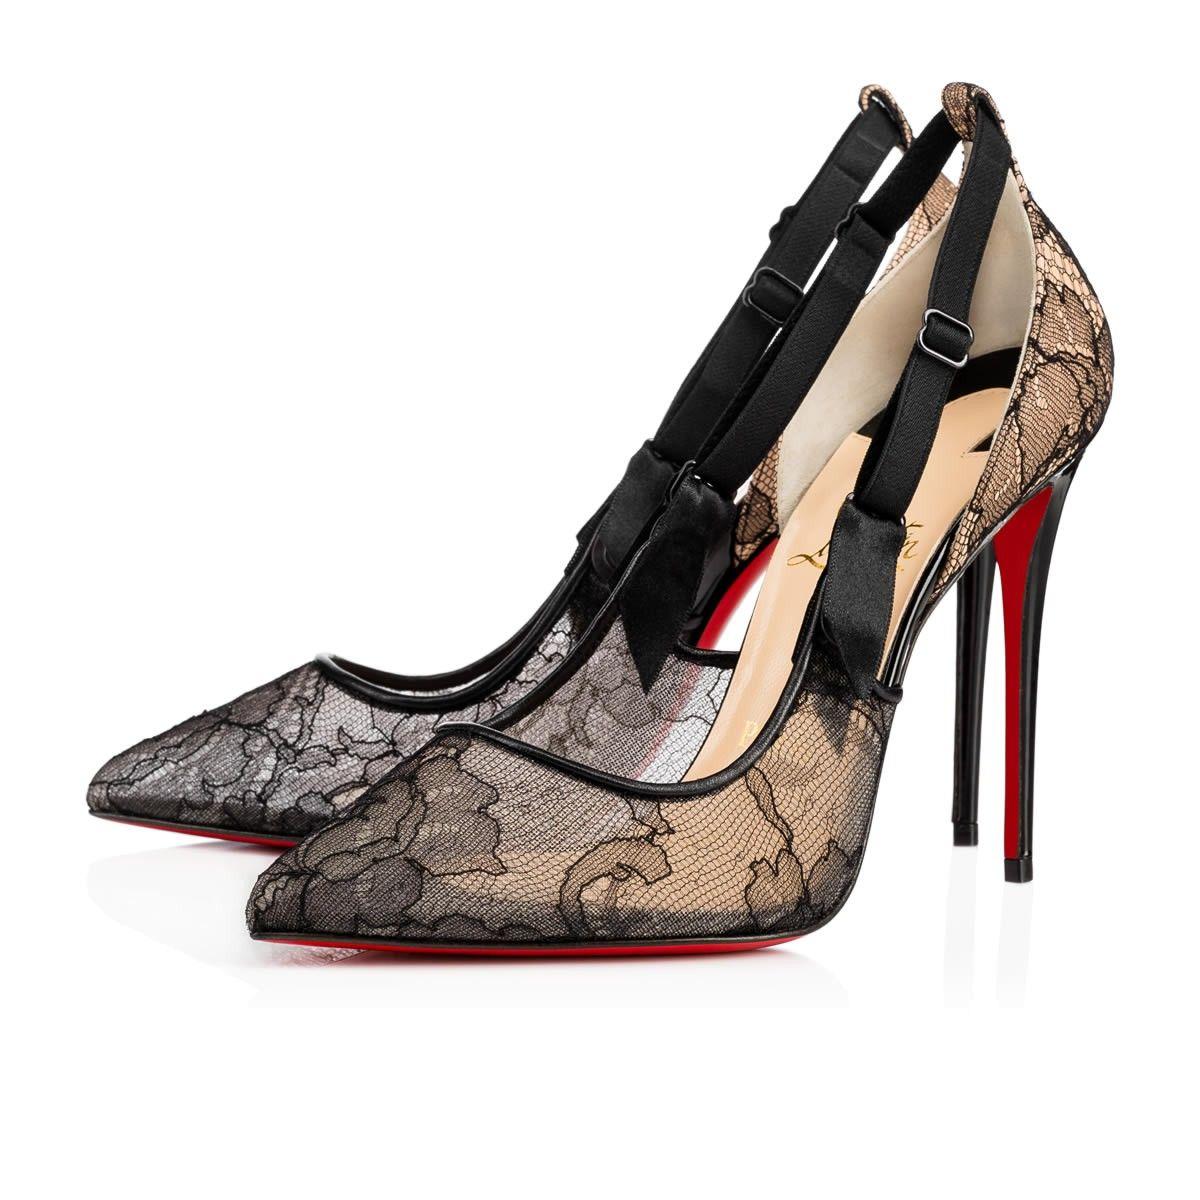 CHRISTIAN LOUBOUTIN Hot Jeanbi 100 Version Black Lace - Women Shoes -  Christian Louboutin.  christianlouboutin  shoes   f2eaa873a68b